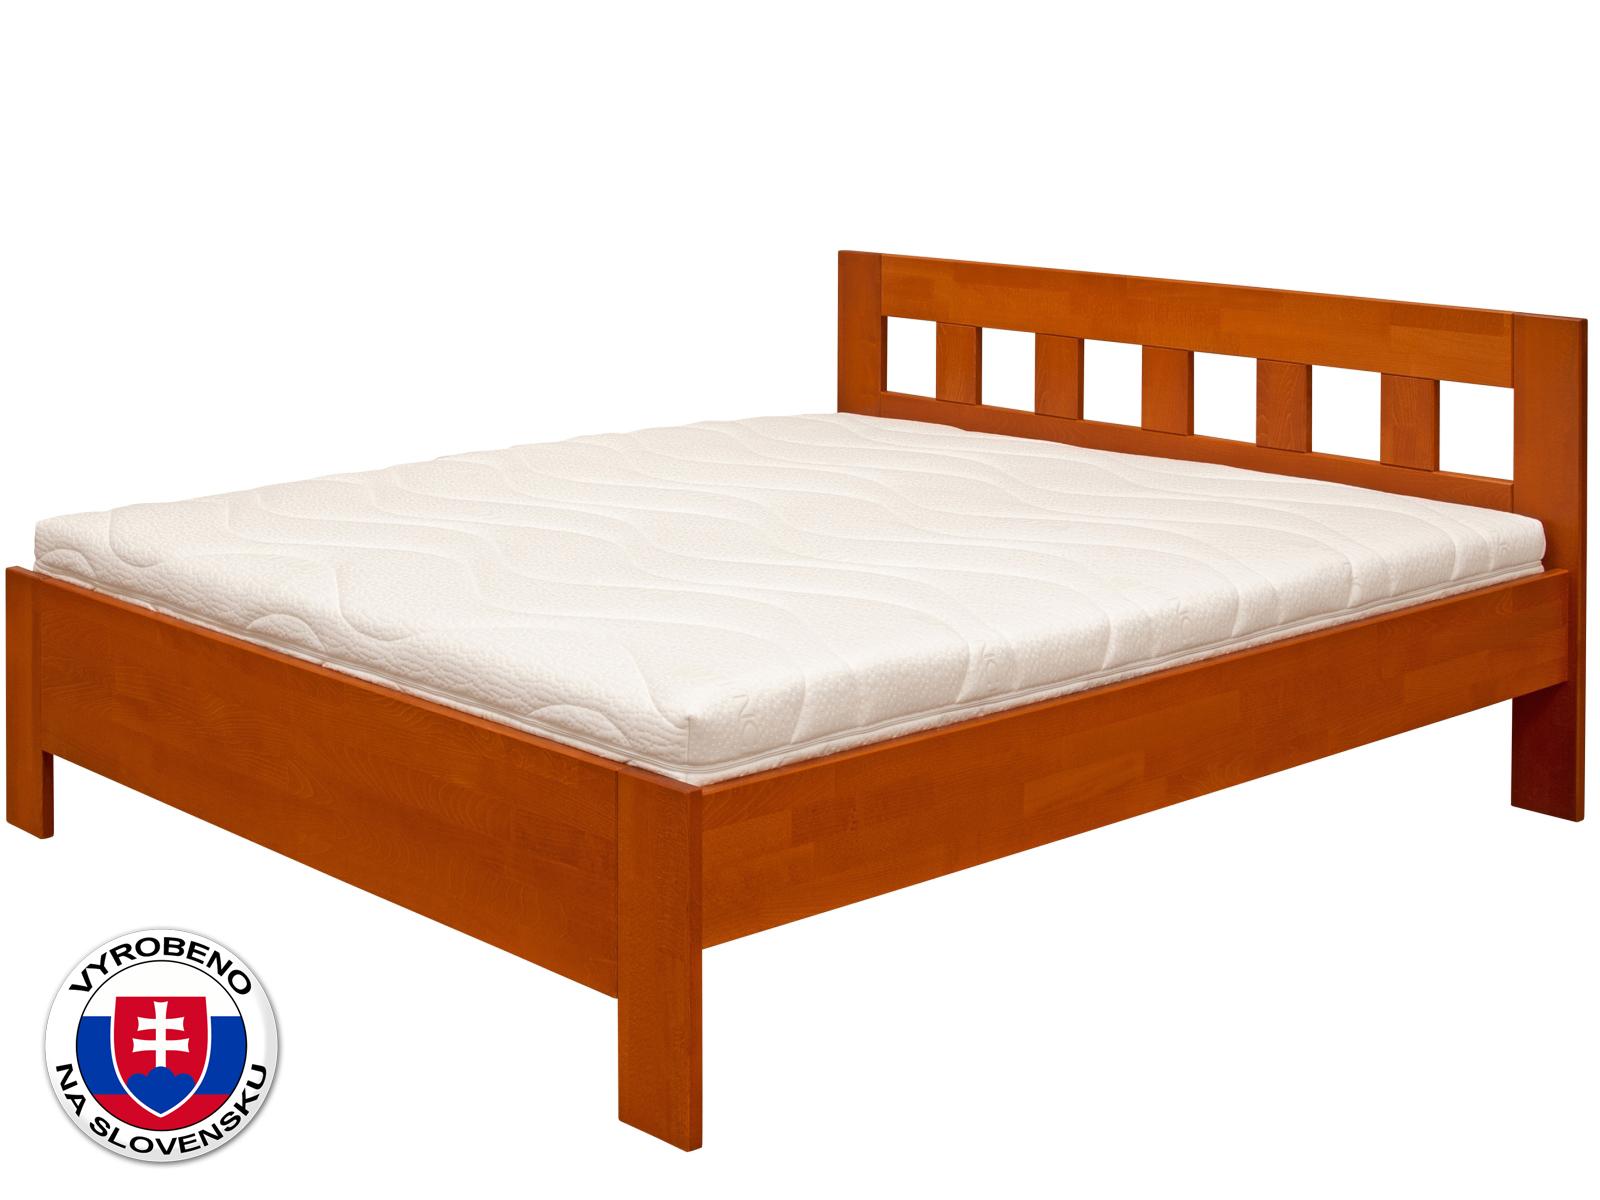 Jednolůžková postel 90 cm - Purtex - Poppy (masiv)